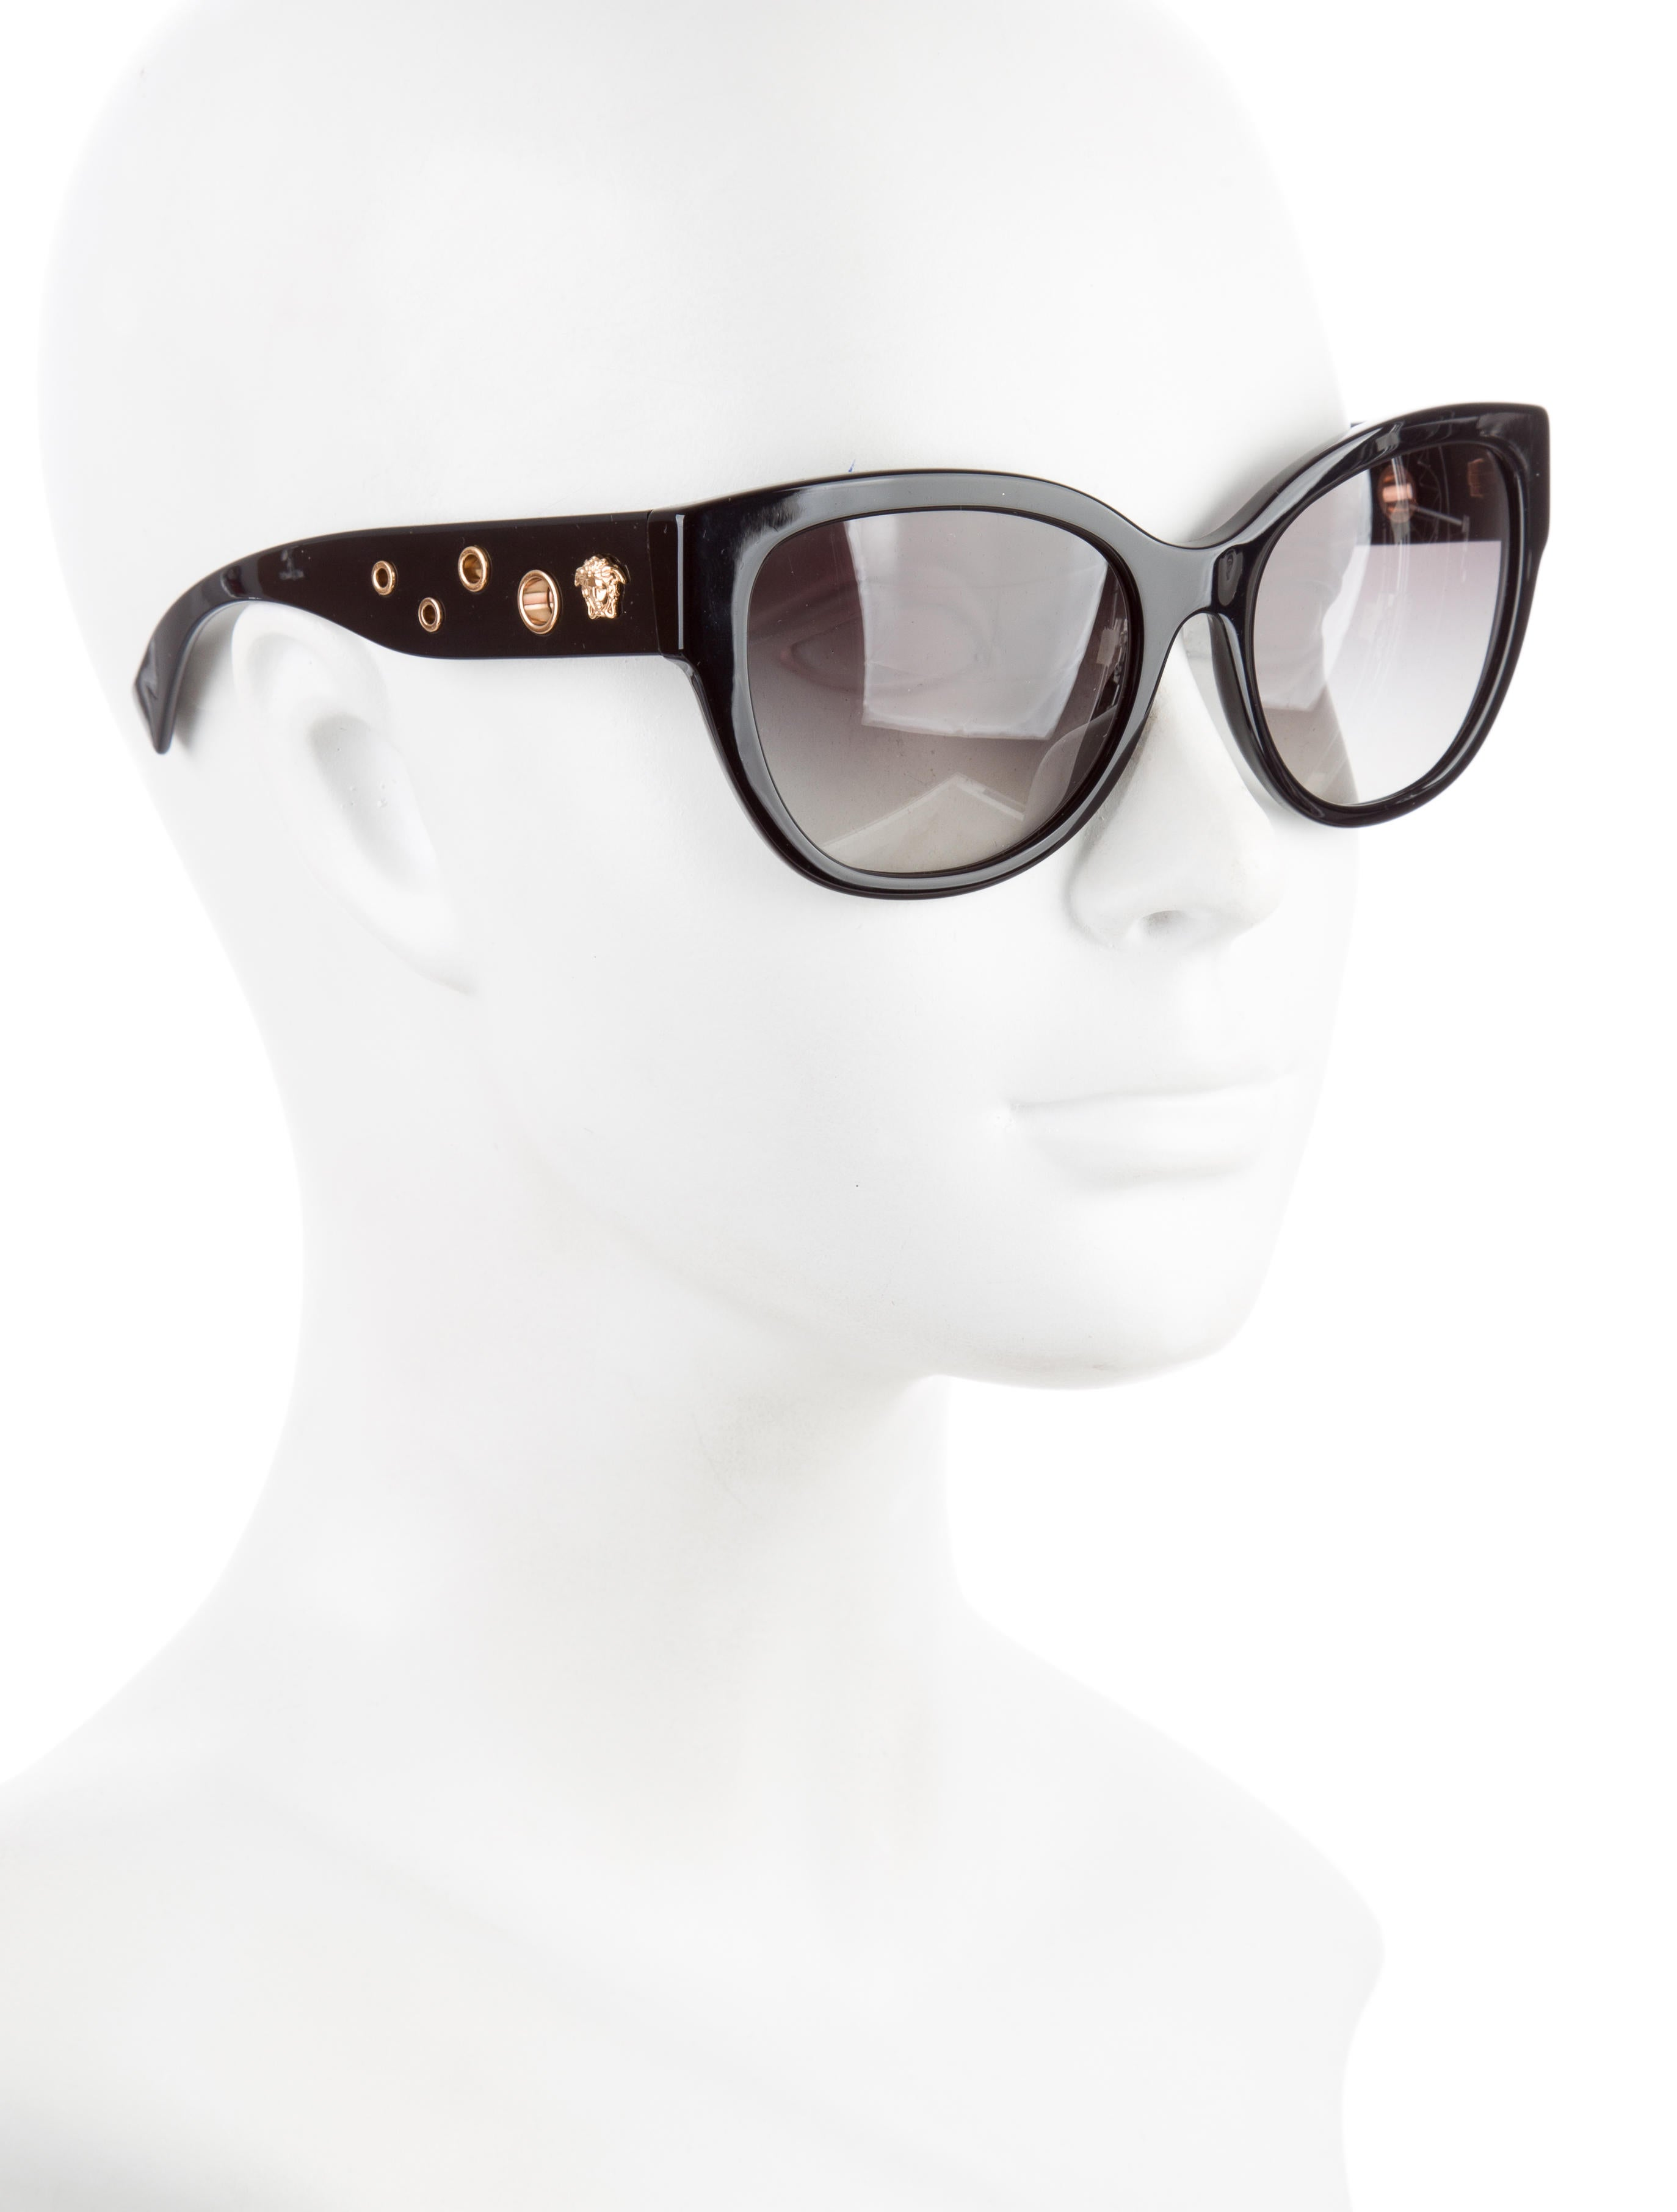 95f37cdbf1 Versace Medusa Cat Eye Sunglasses - Bitterroot Public Library